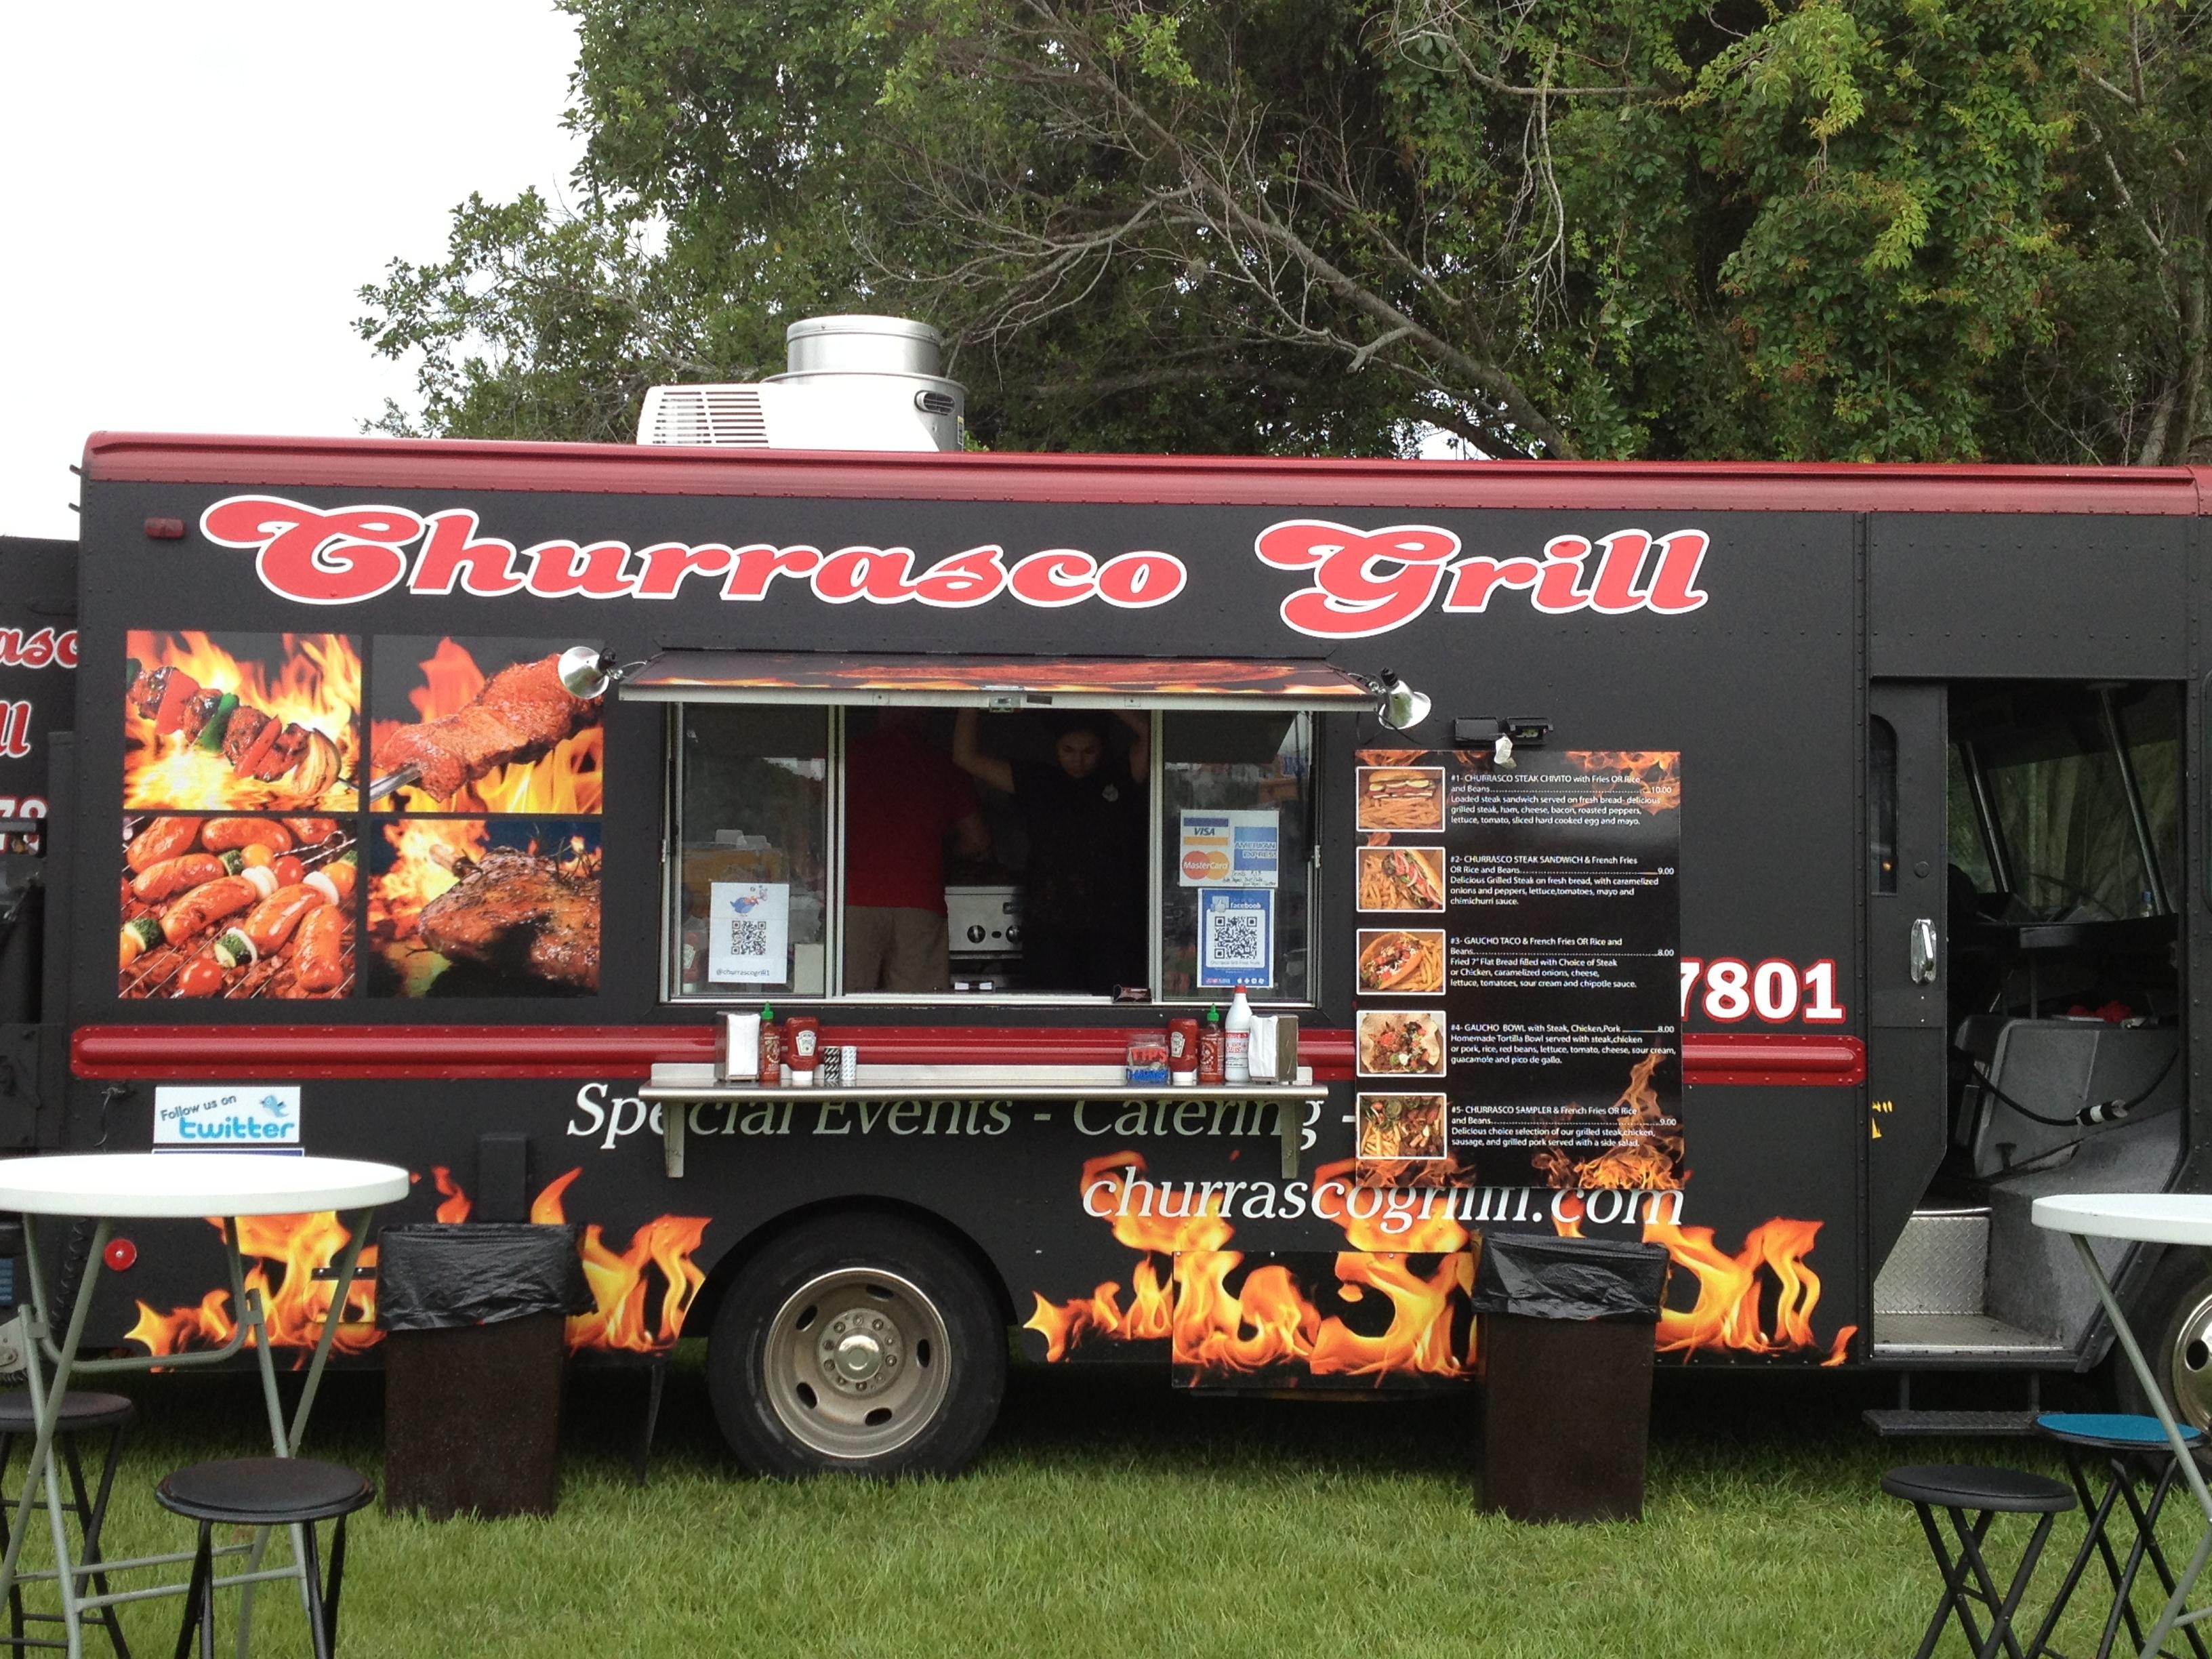 Churrasco Grill | Food Trucks In West Palm Beach FL